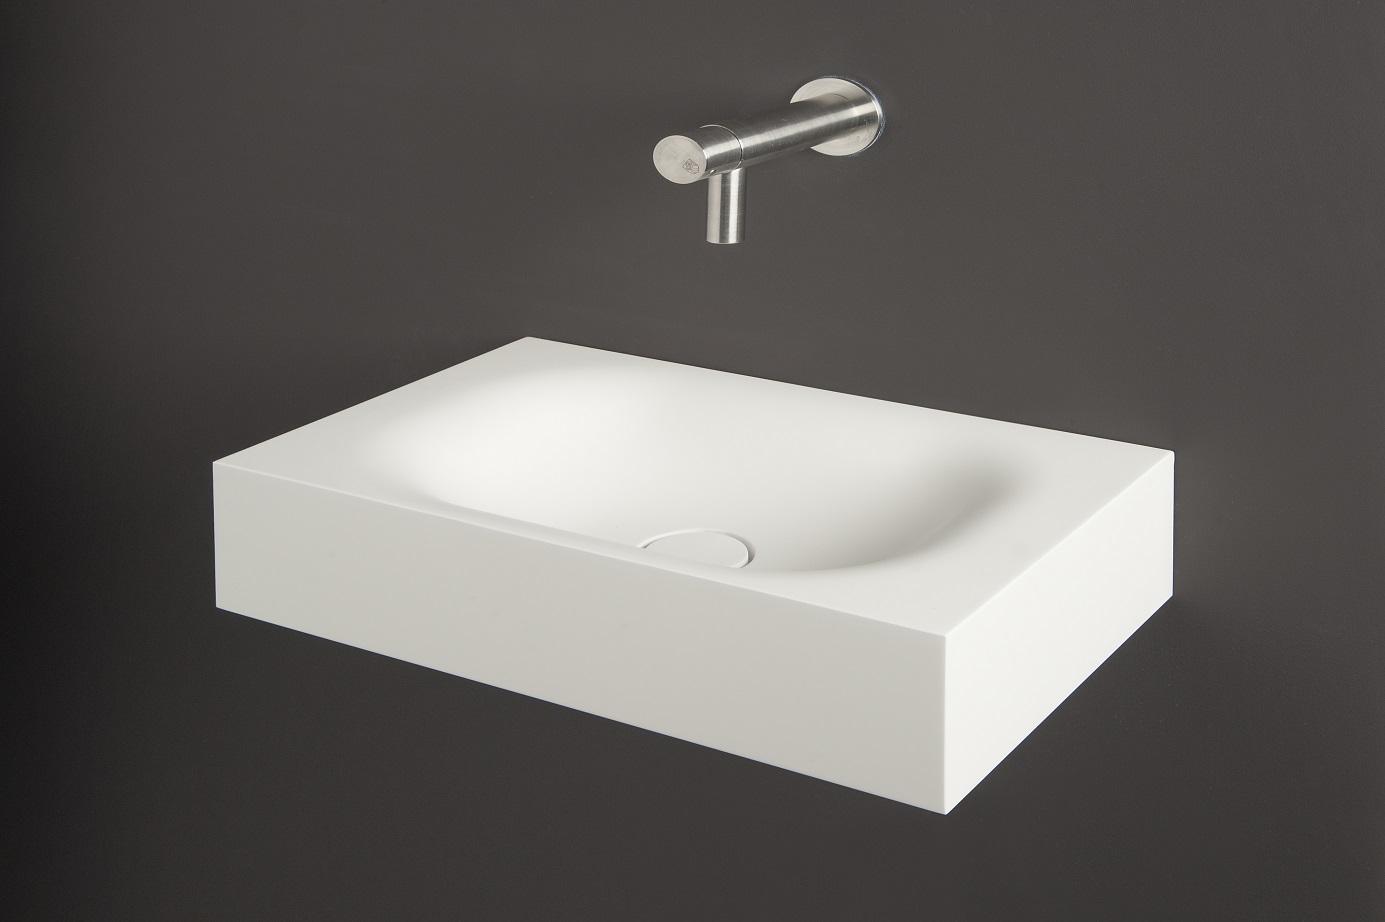 Toiletfontein renesse 40 tiz design